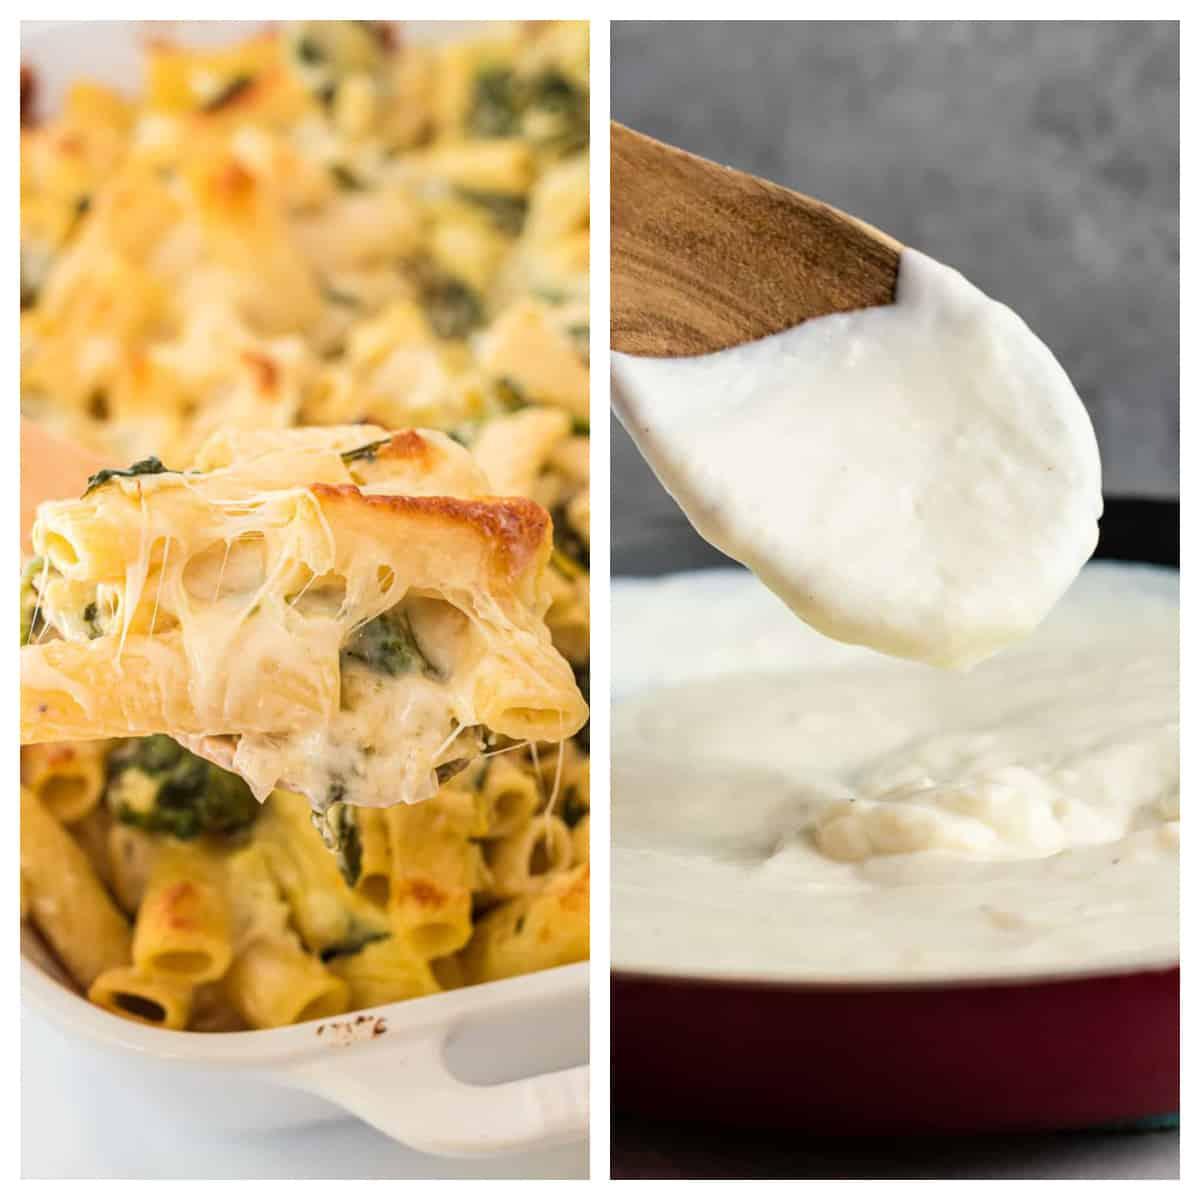 collage image showing spinach artichoke pasta bake and cauliflower alfredo sauce